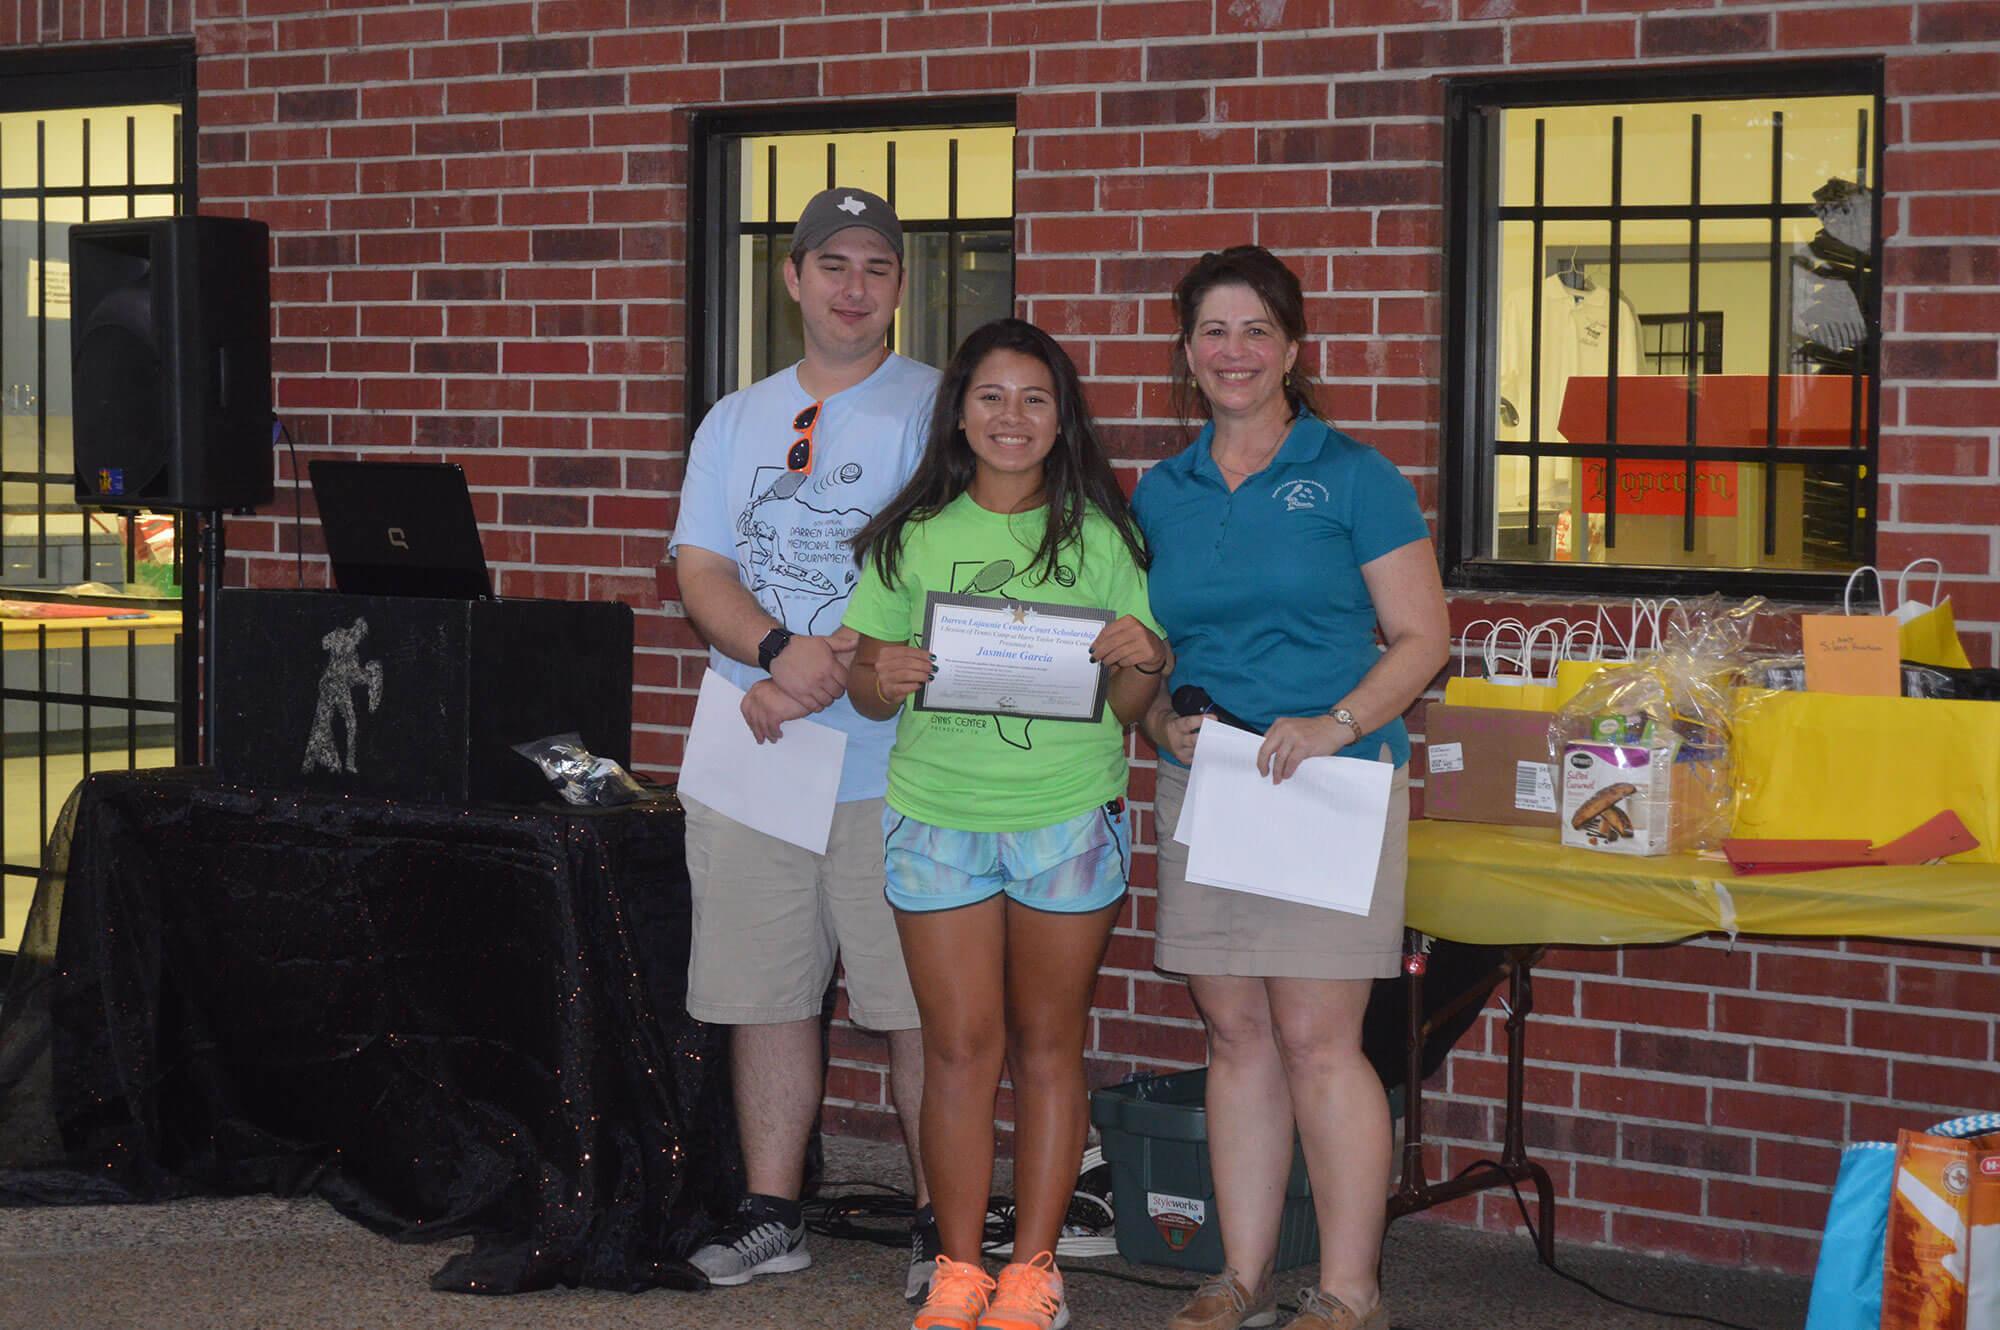 Darren Lajaunie Tennis Scholarships